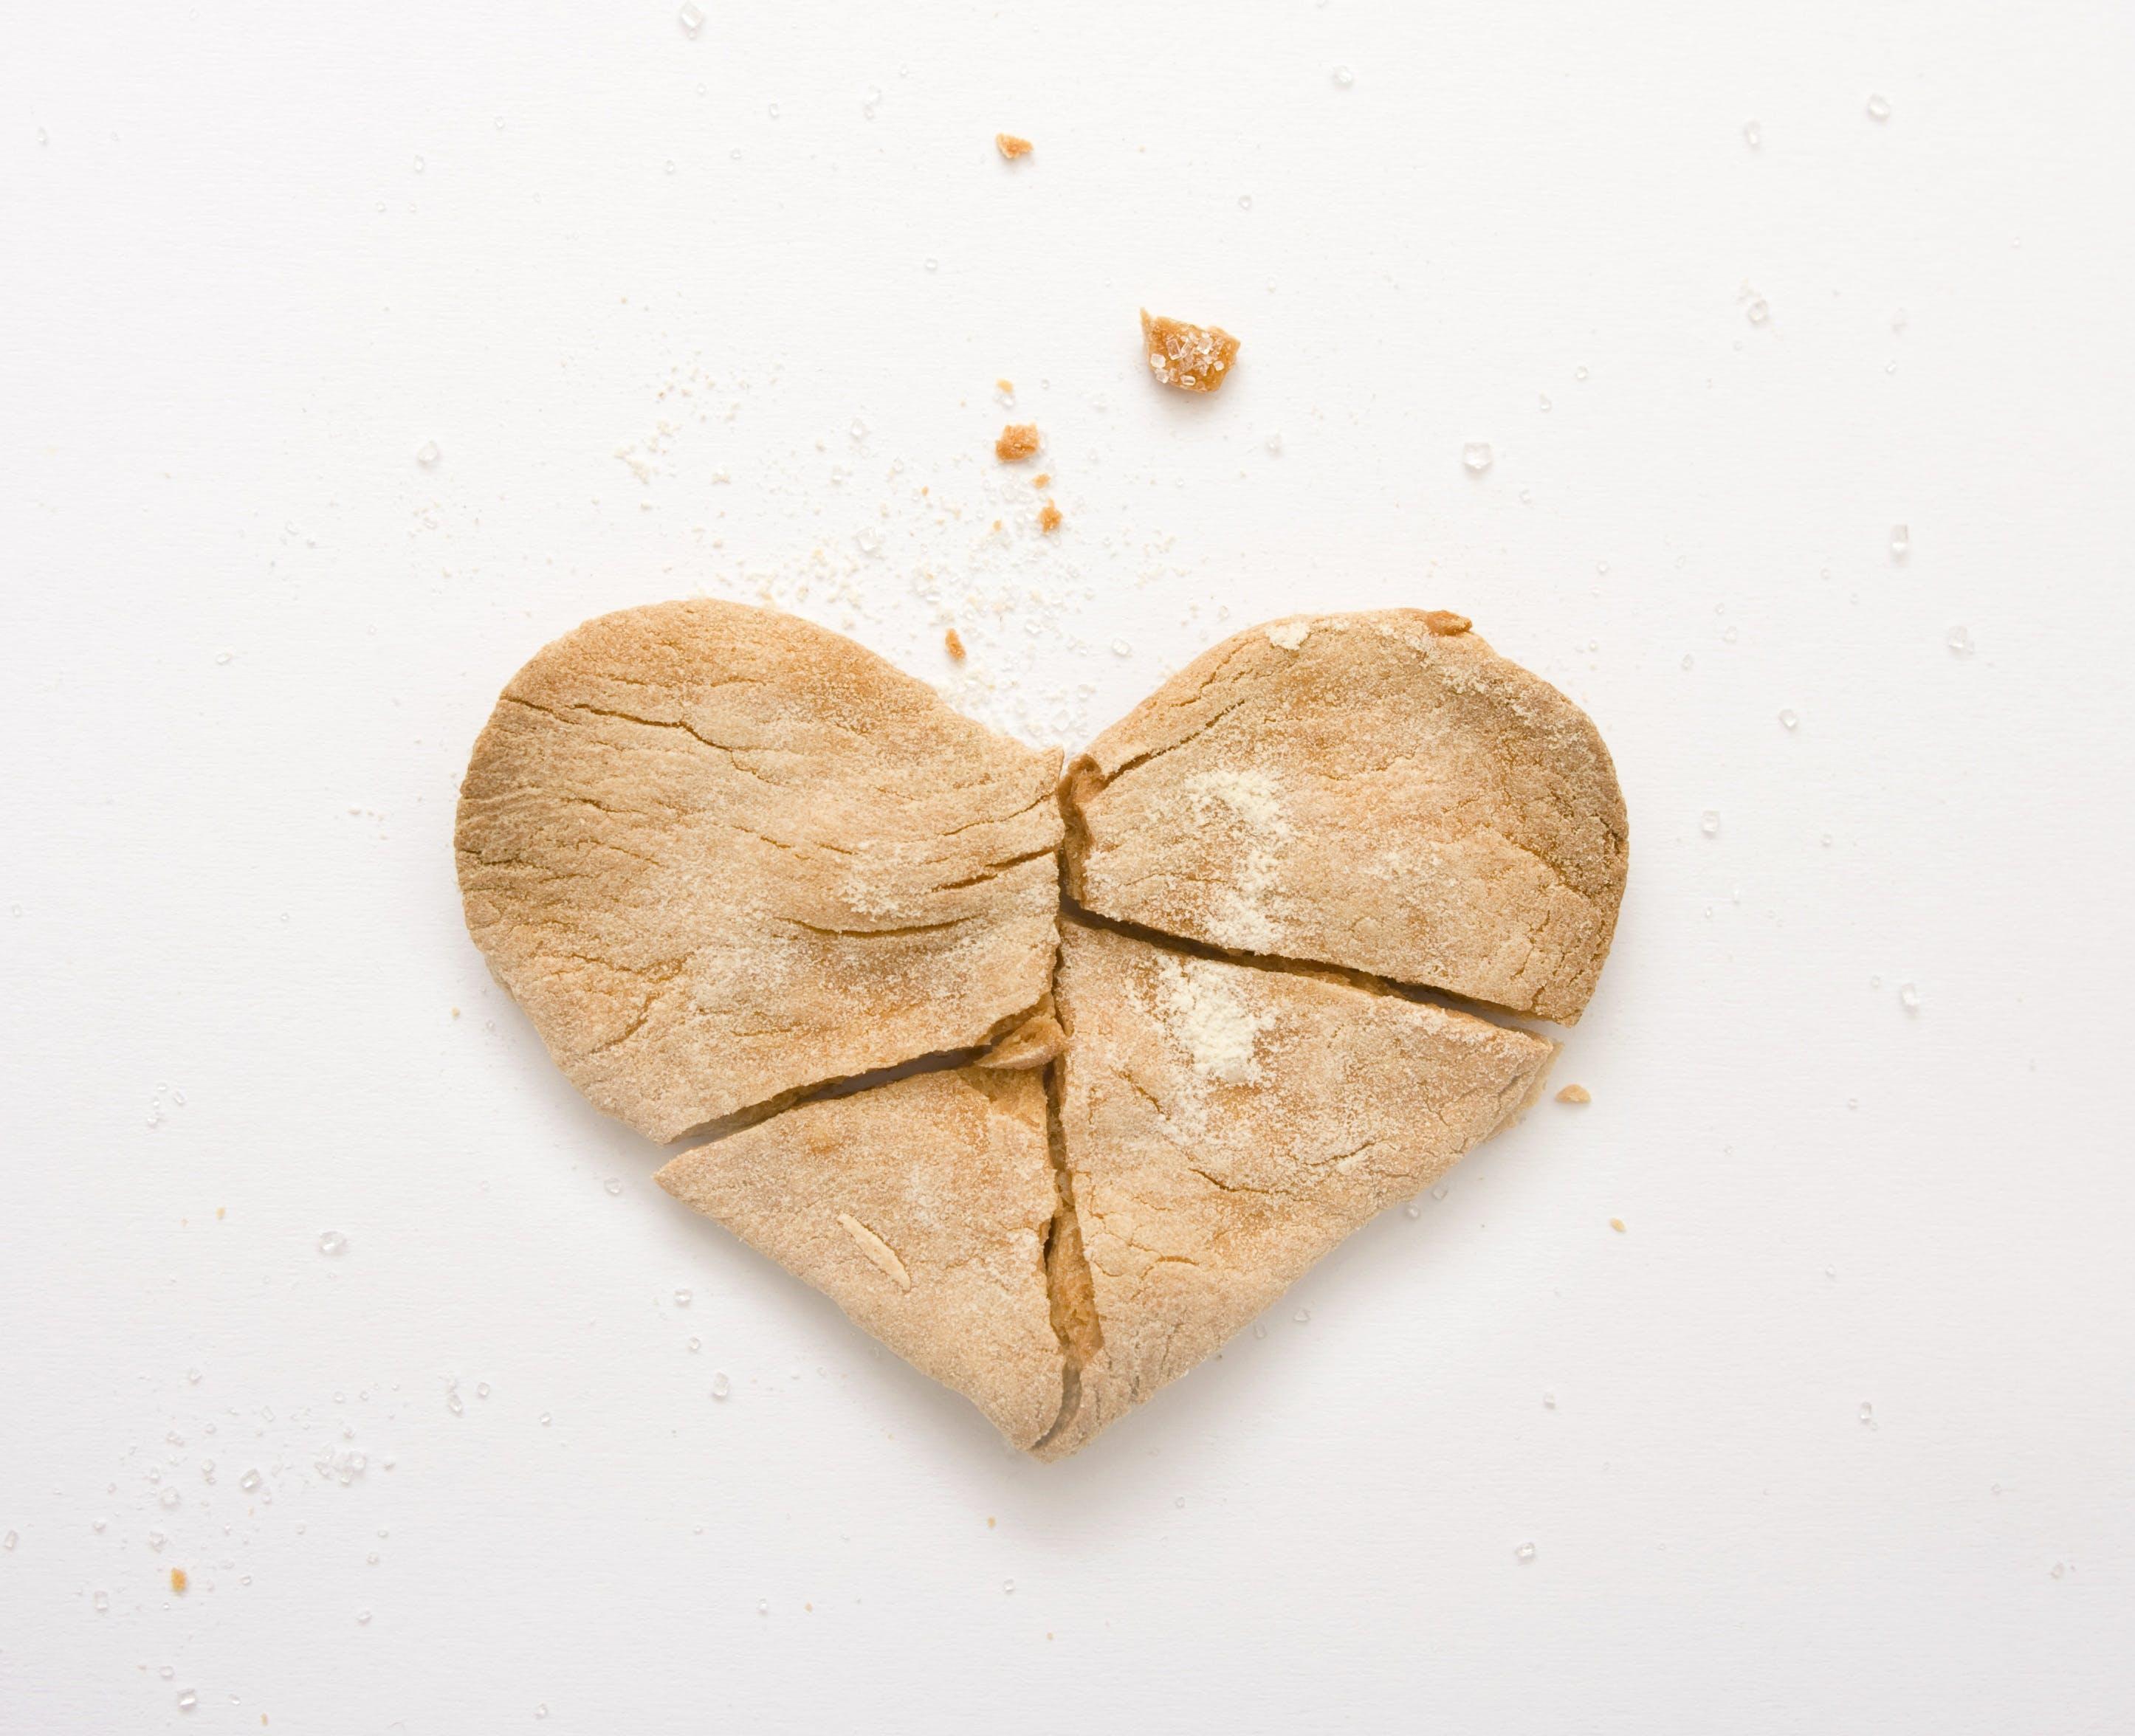 Free stock photo of heart, romantic, broken, emotion